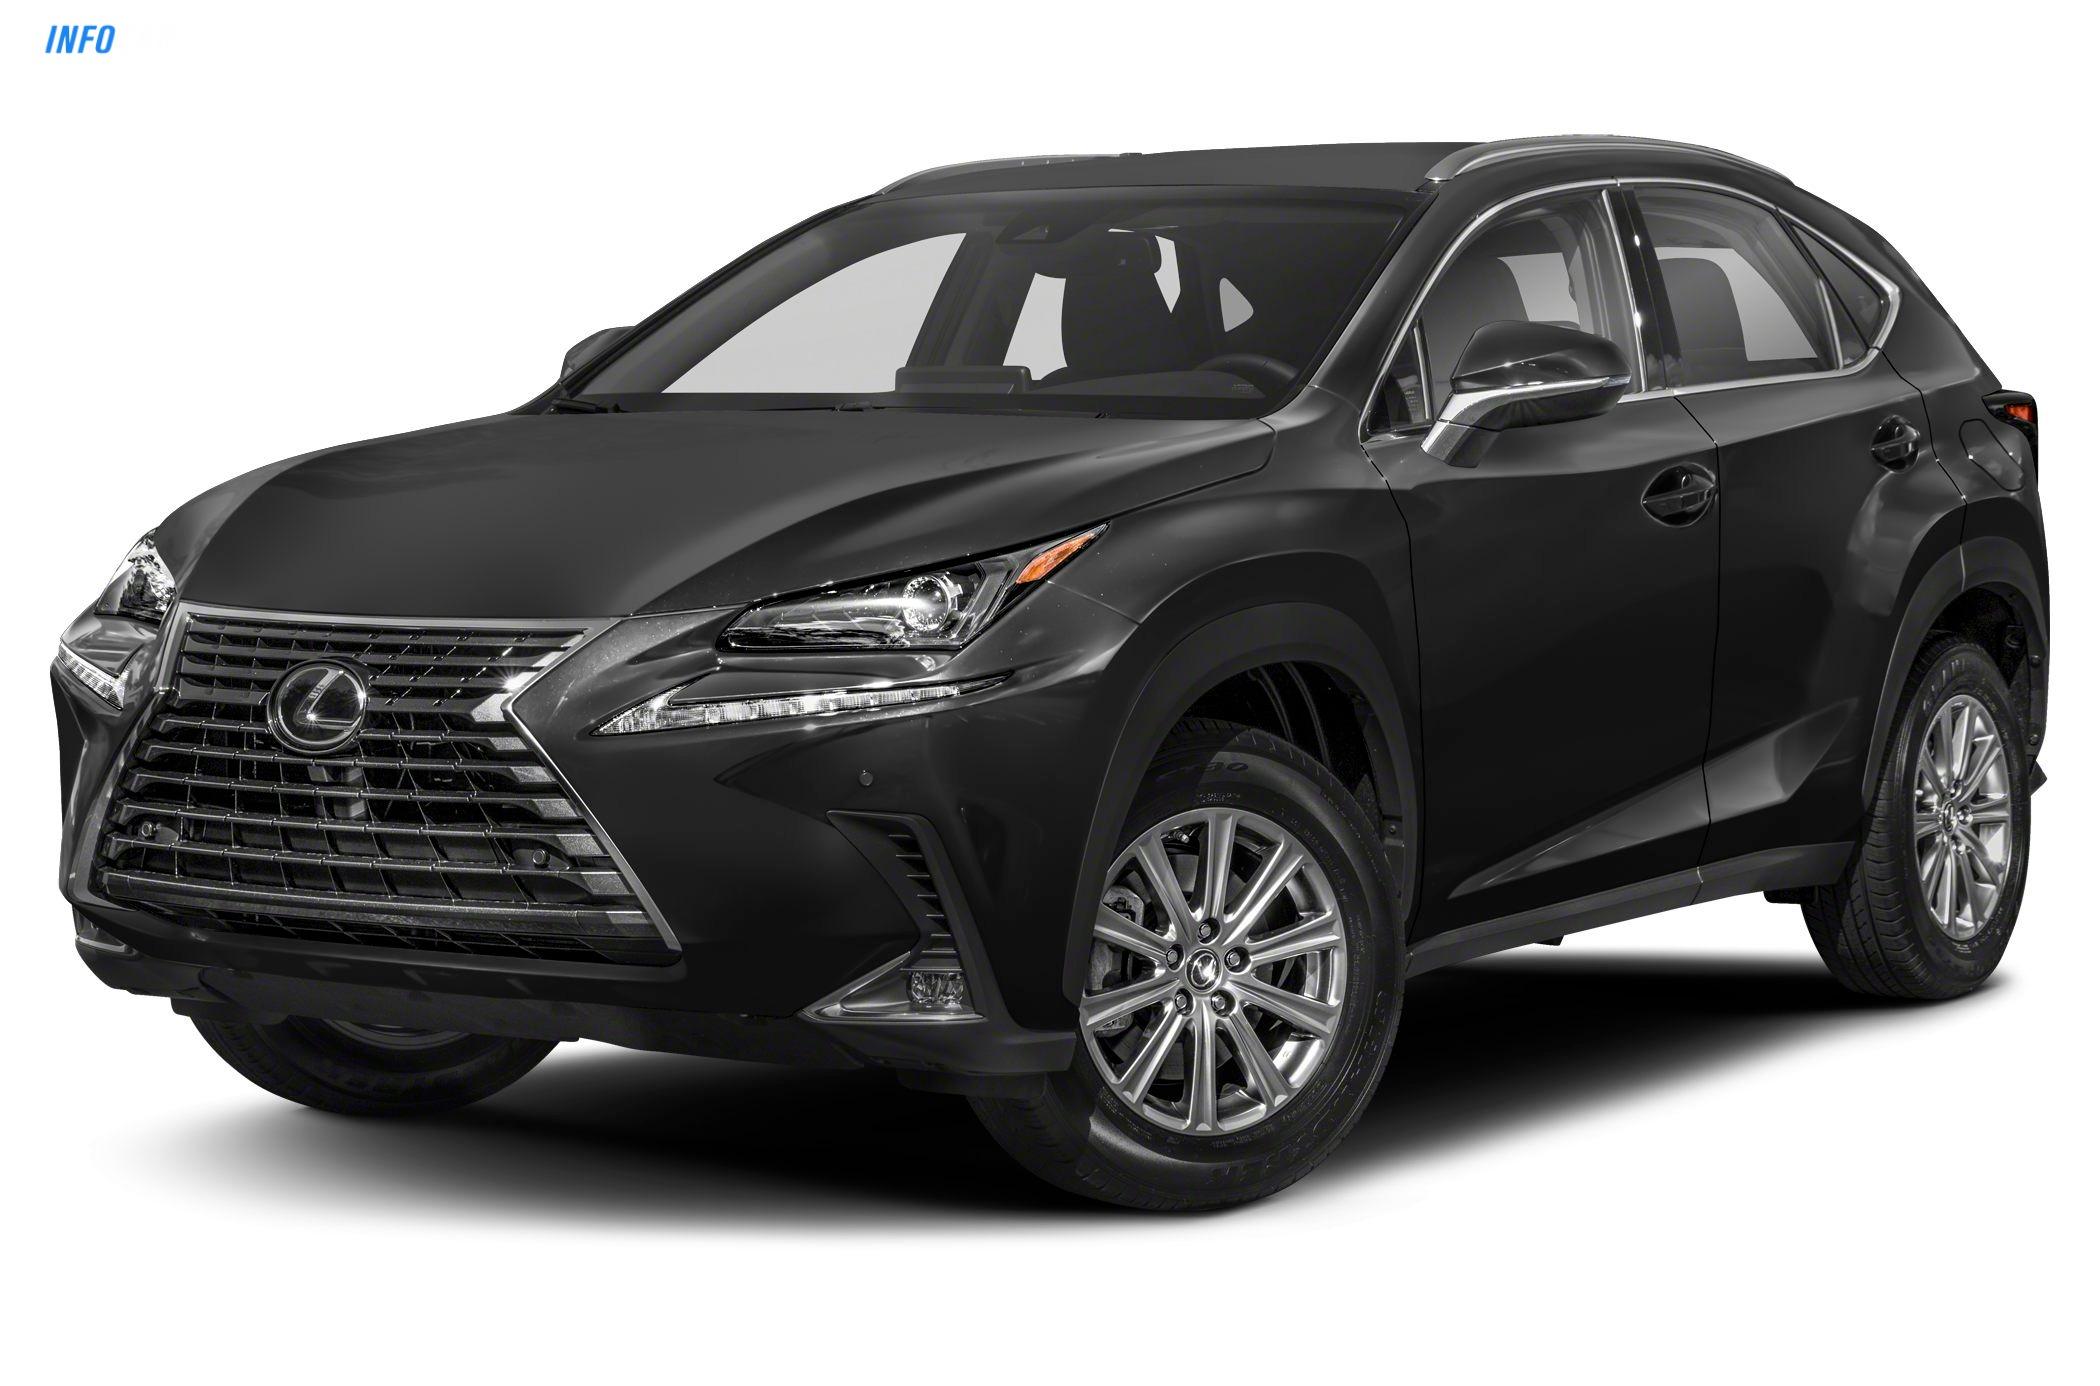 2020 Lexus NX 300 base - INFOCAR - Toronto's Most Comprehensive New and Used Auto Trading Platform